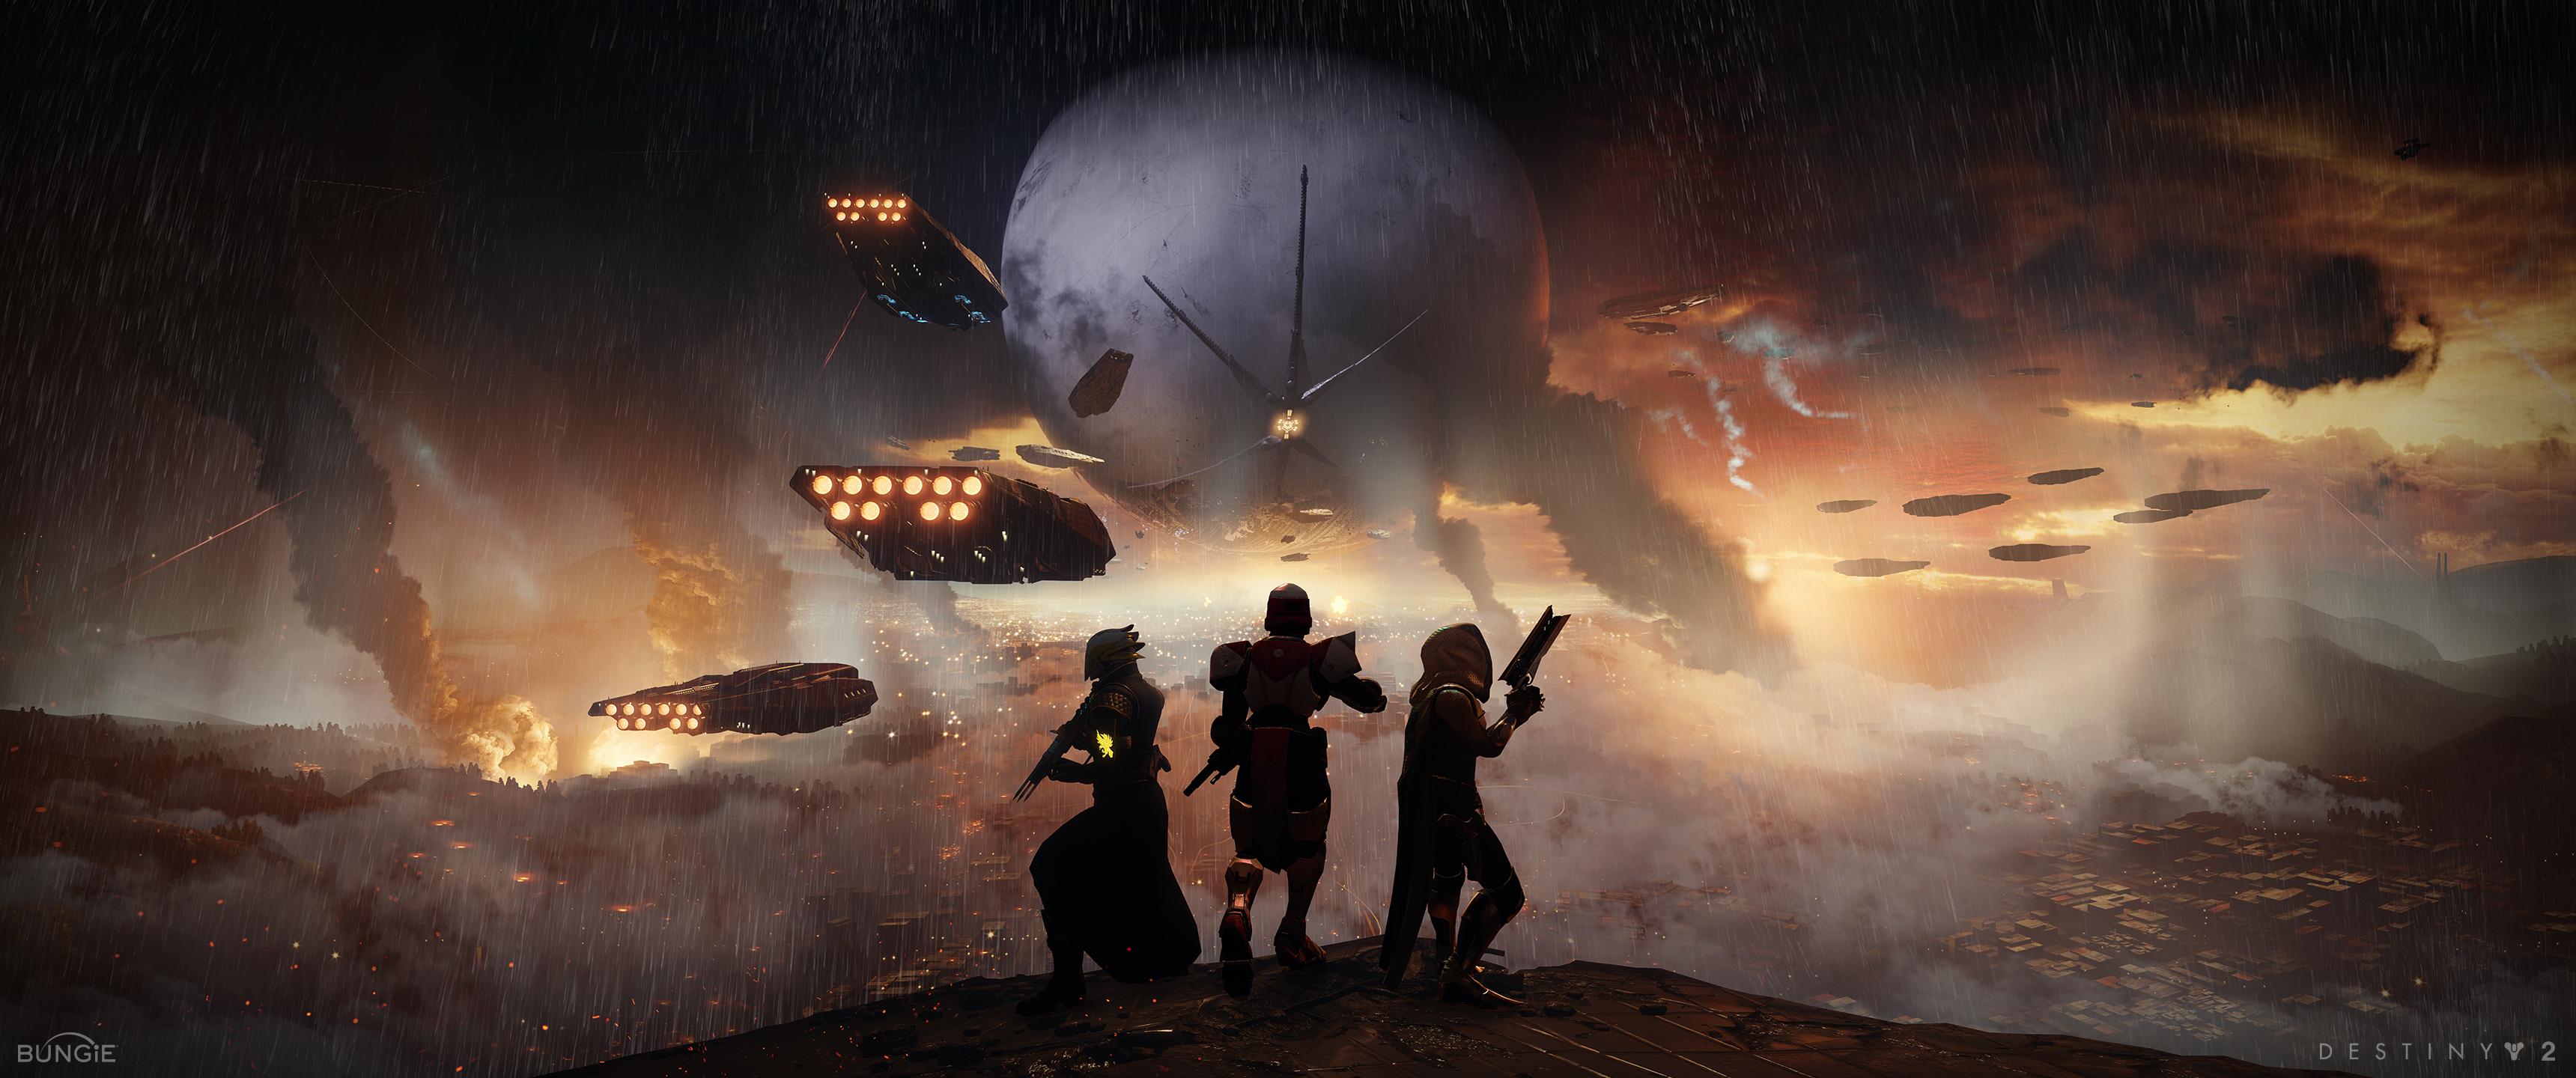 destiny 2 4k 2017 hd games 4k wallpapers images backgrounds